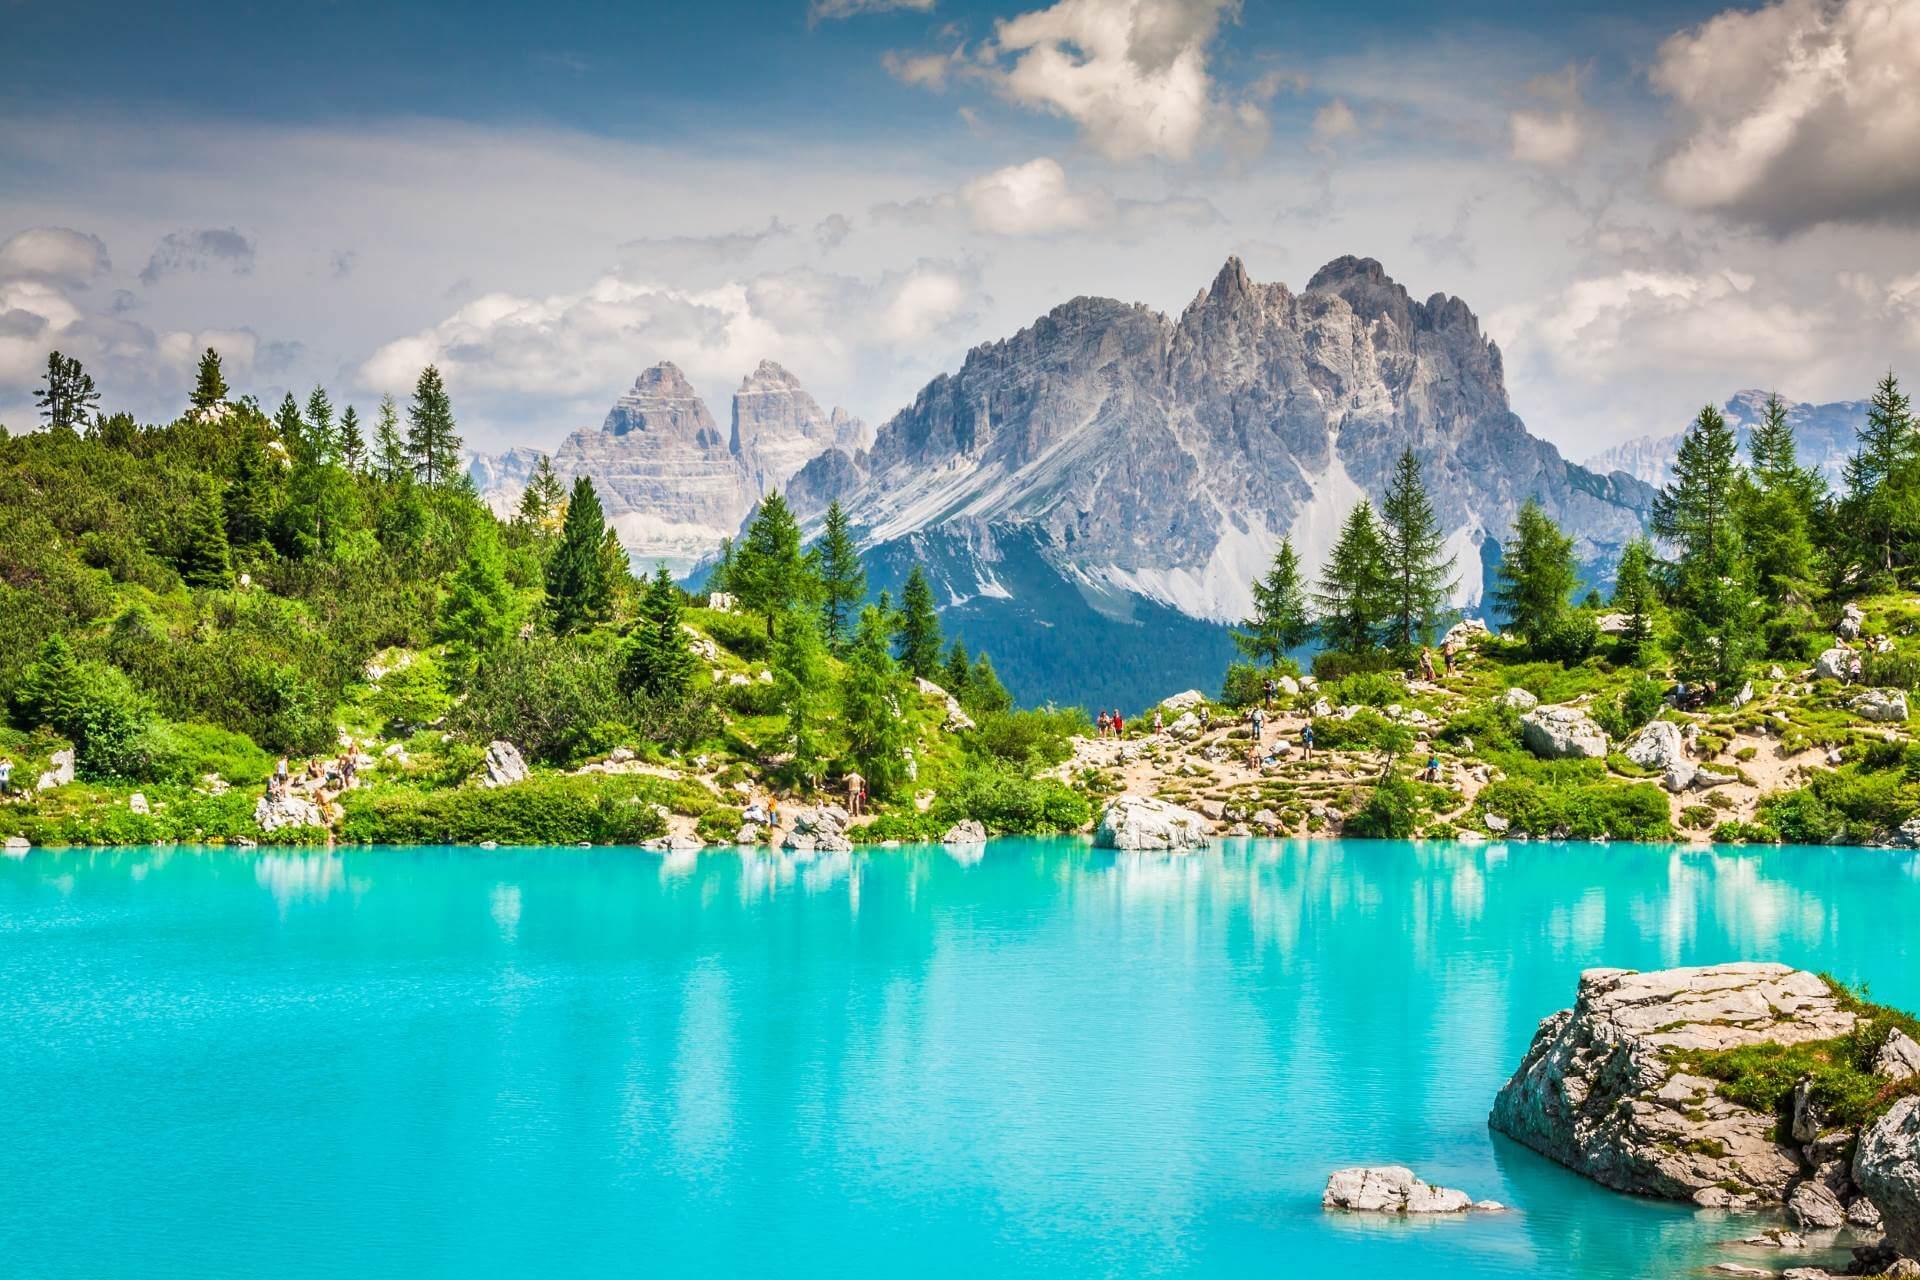 Berge und See in Lingurien